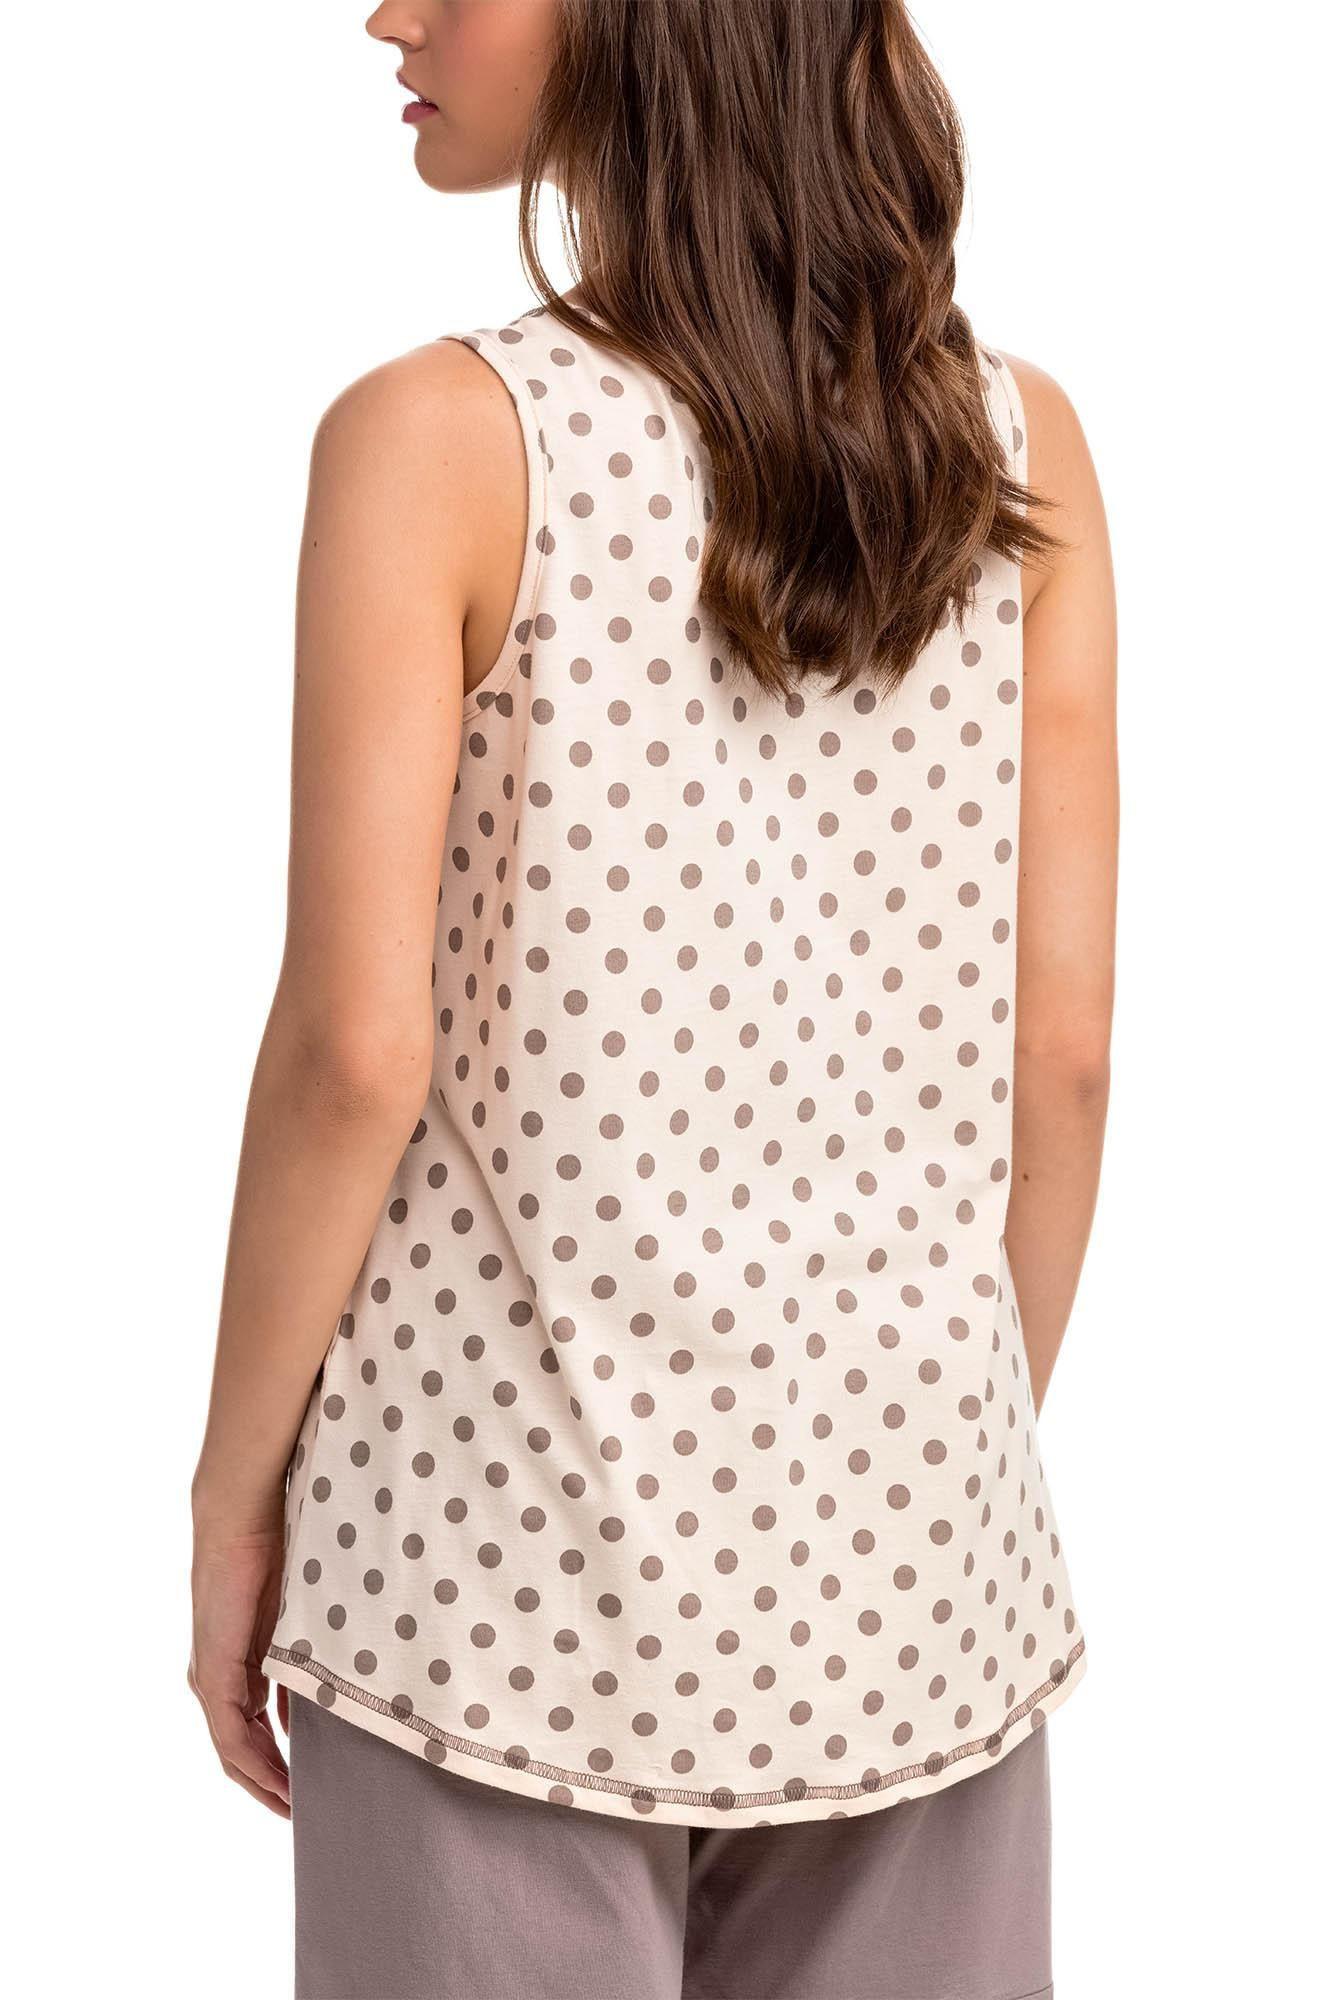 Pohodlné dvojdielne dámske pyžamo 14301 - Vanilka / bodkami S